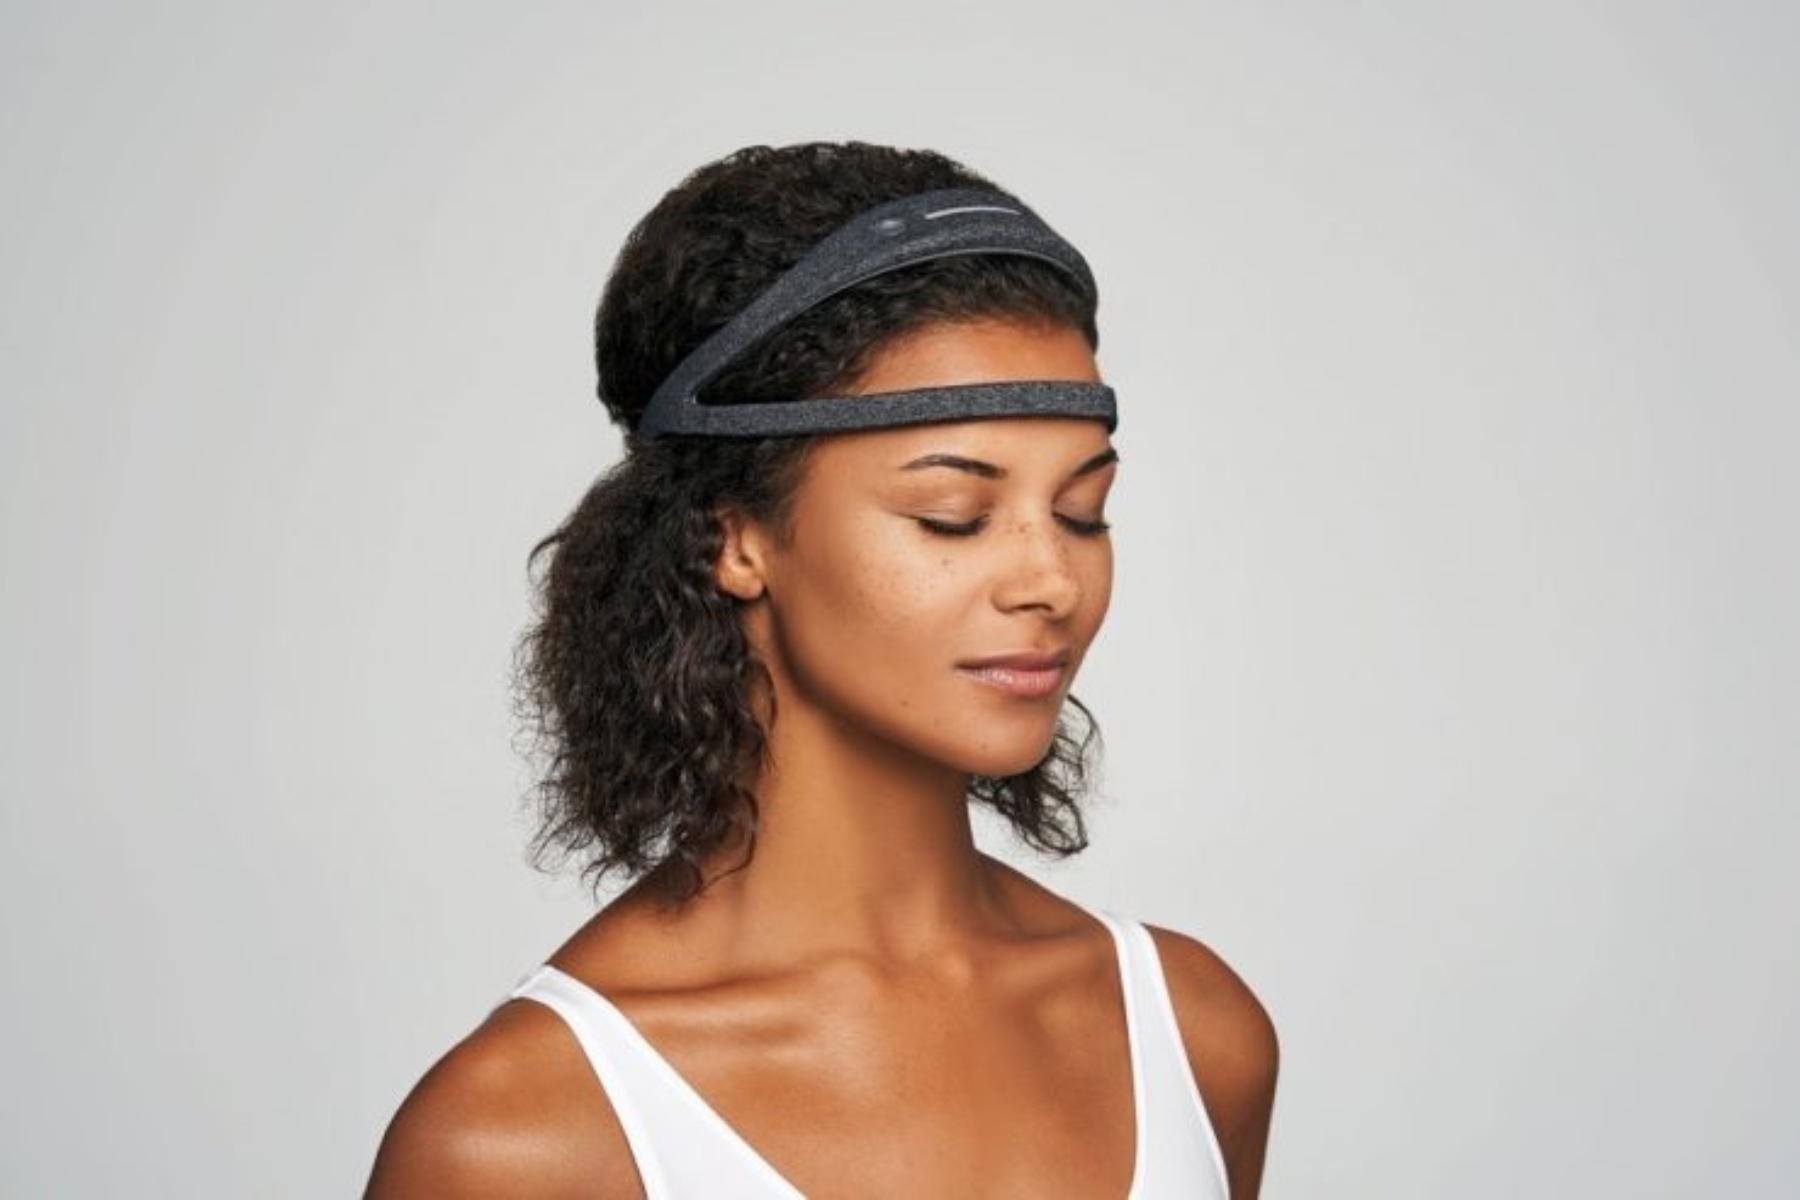 Smart headbands: Μια συσκευή νευροανάδρασης που προωθεί την ηρεμία